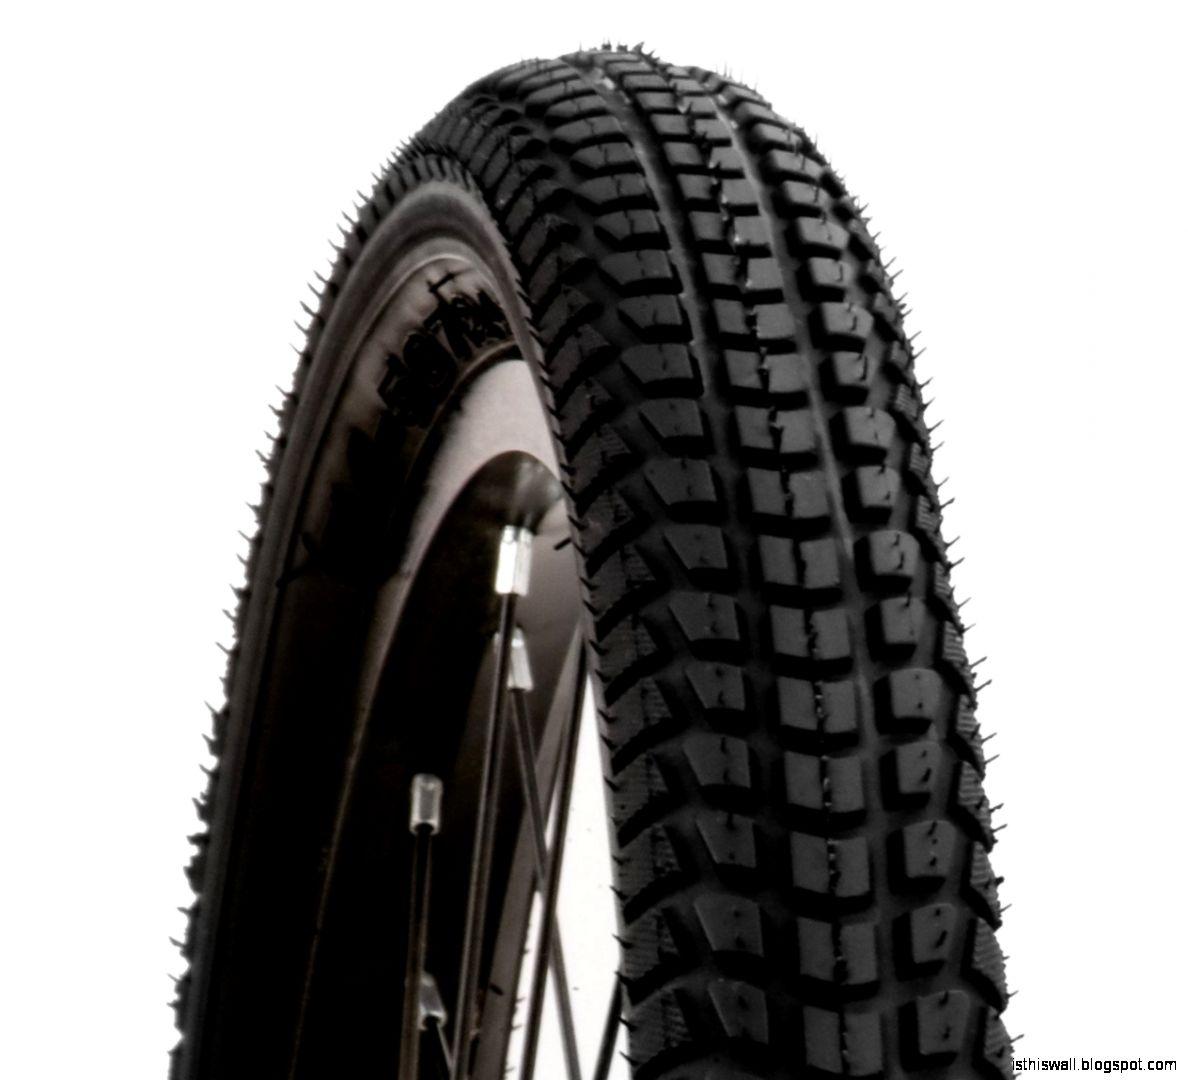 Schwinn Comfort Bike Street Tire with Kevlar